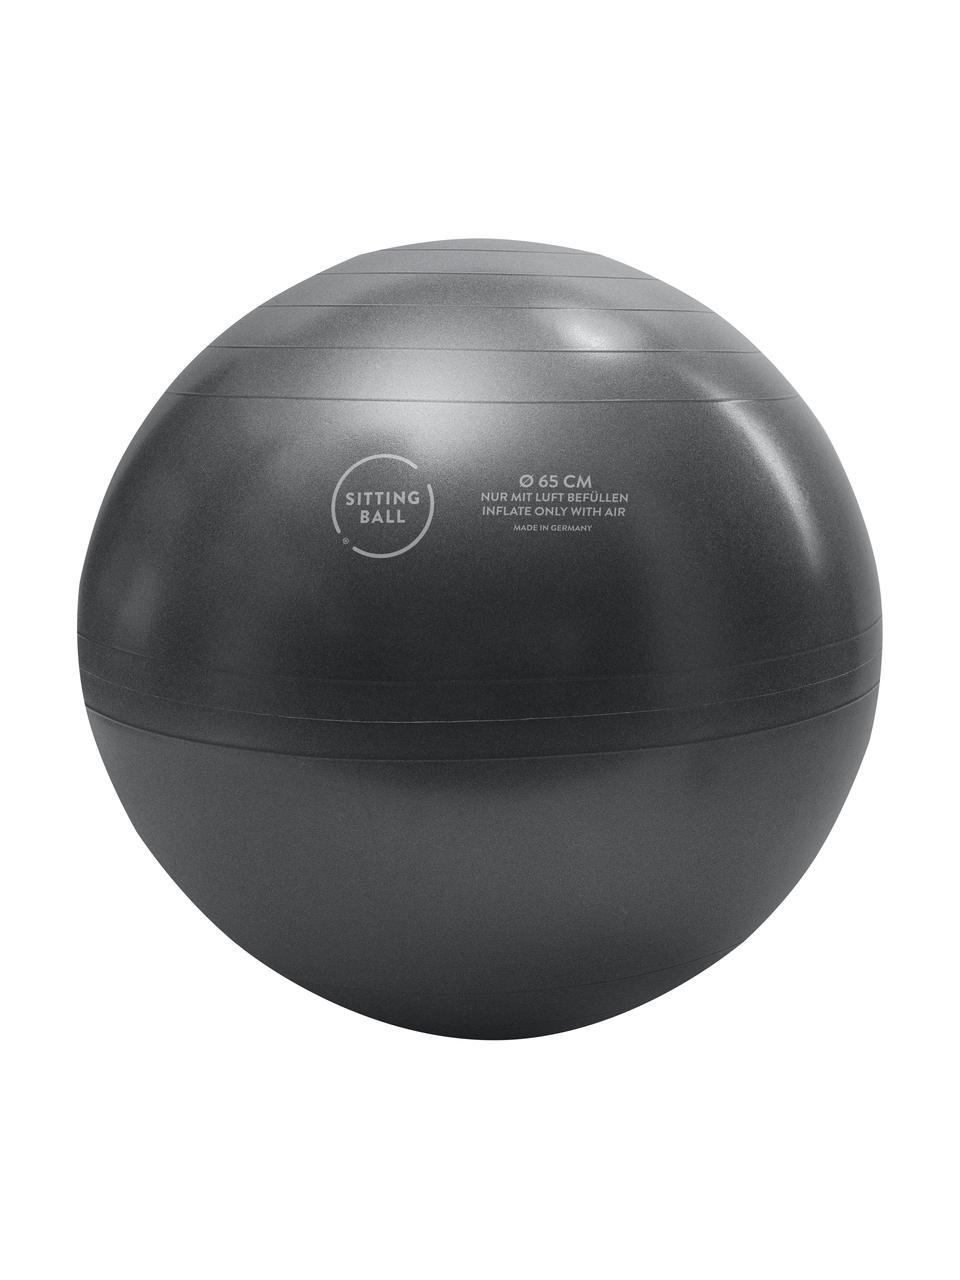 Seduta a sfera Felt, Rivestimento: poliestere (pelle sinteti, Salmone, Ø 65 cm